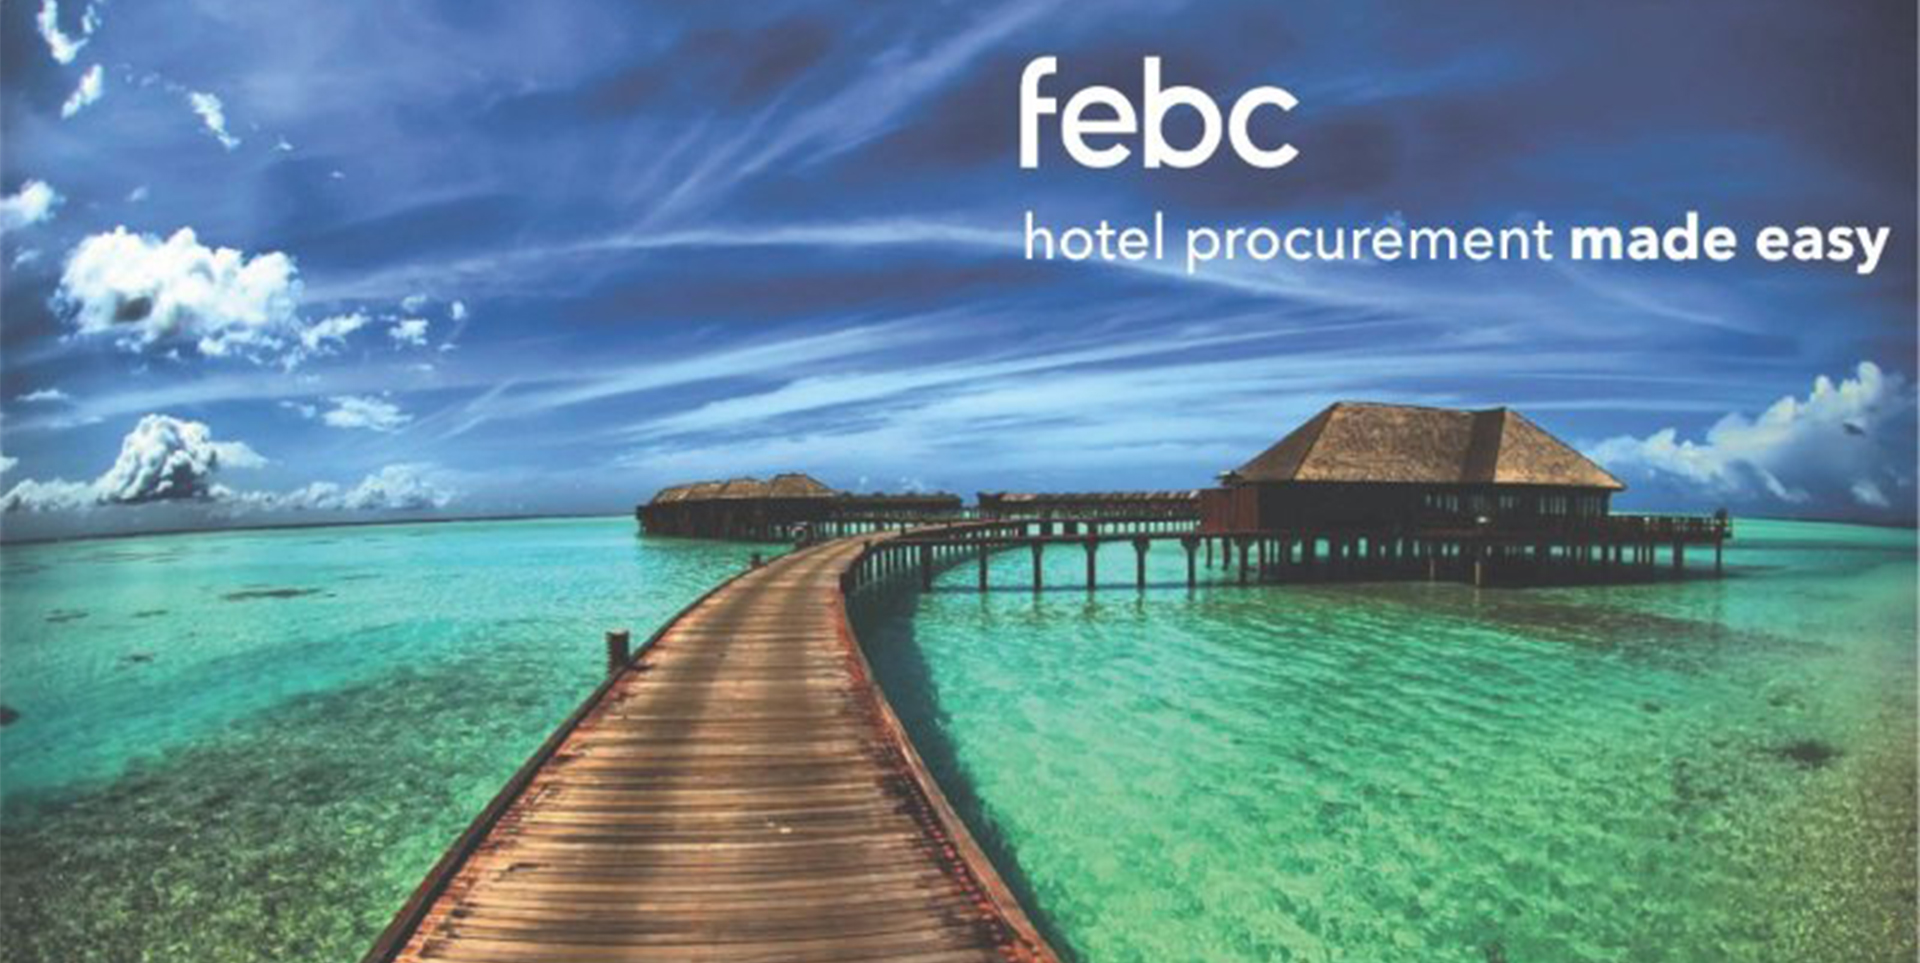 What is hospitality procurement? febc provides a definition TOPHOTELNEWS